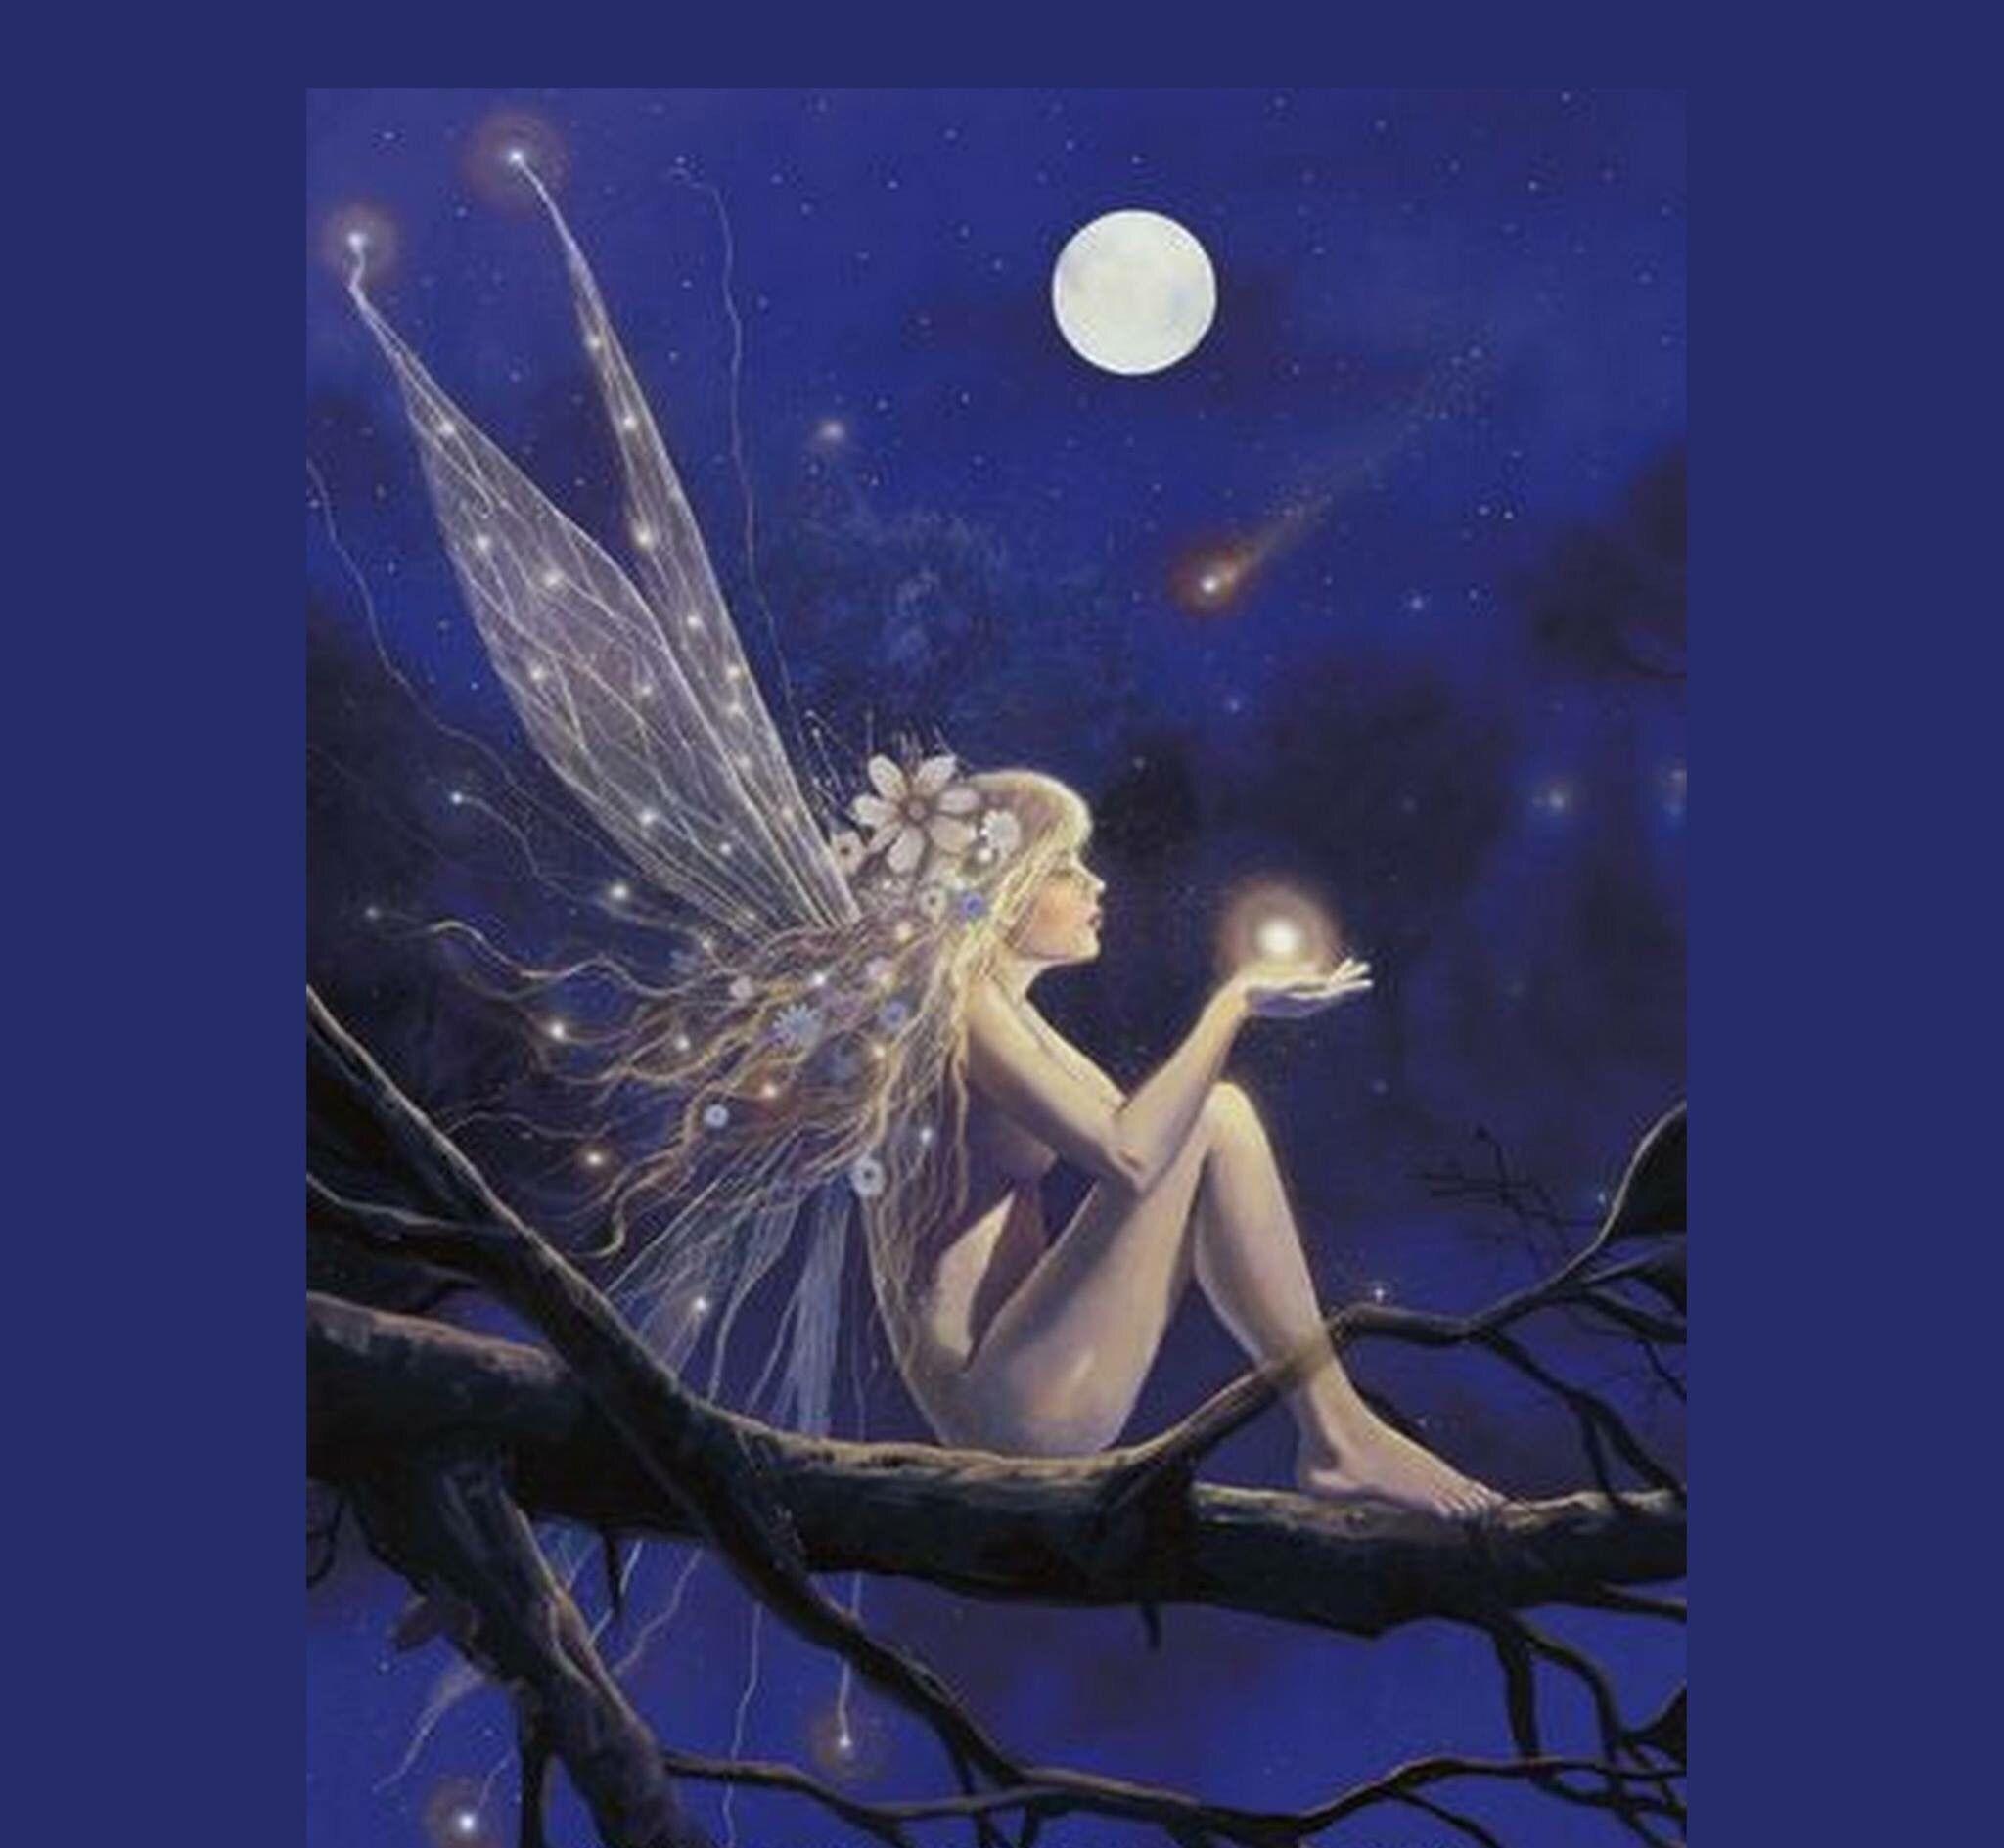 Fairy Sitting On A Tree Branch Holding A Light Orb Fairy Art